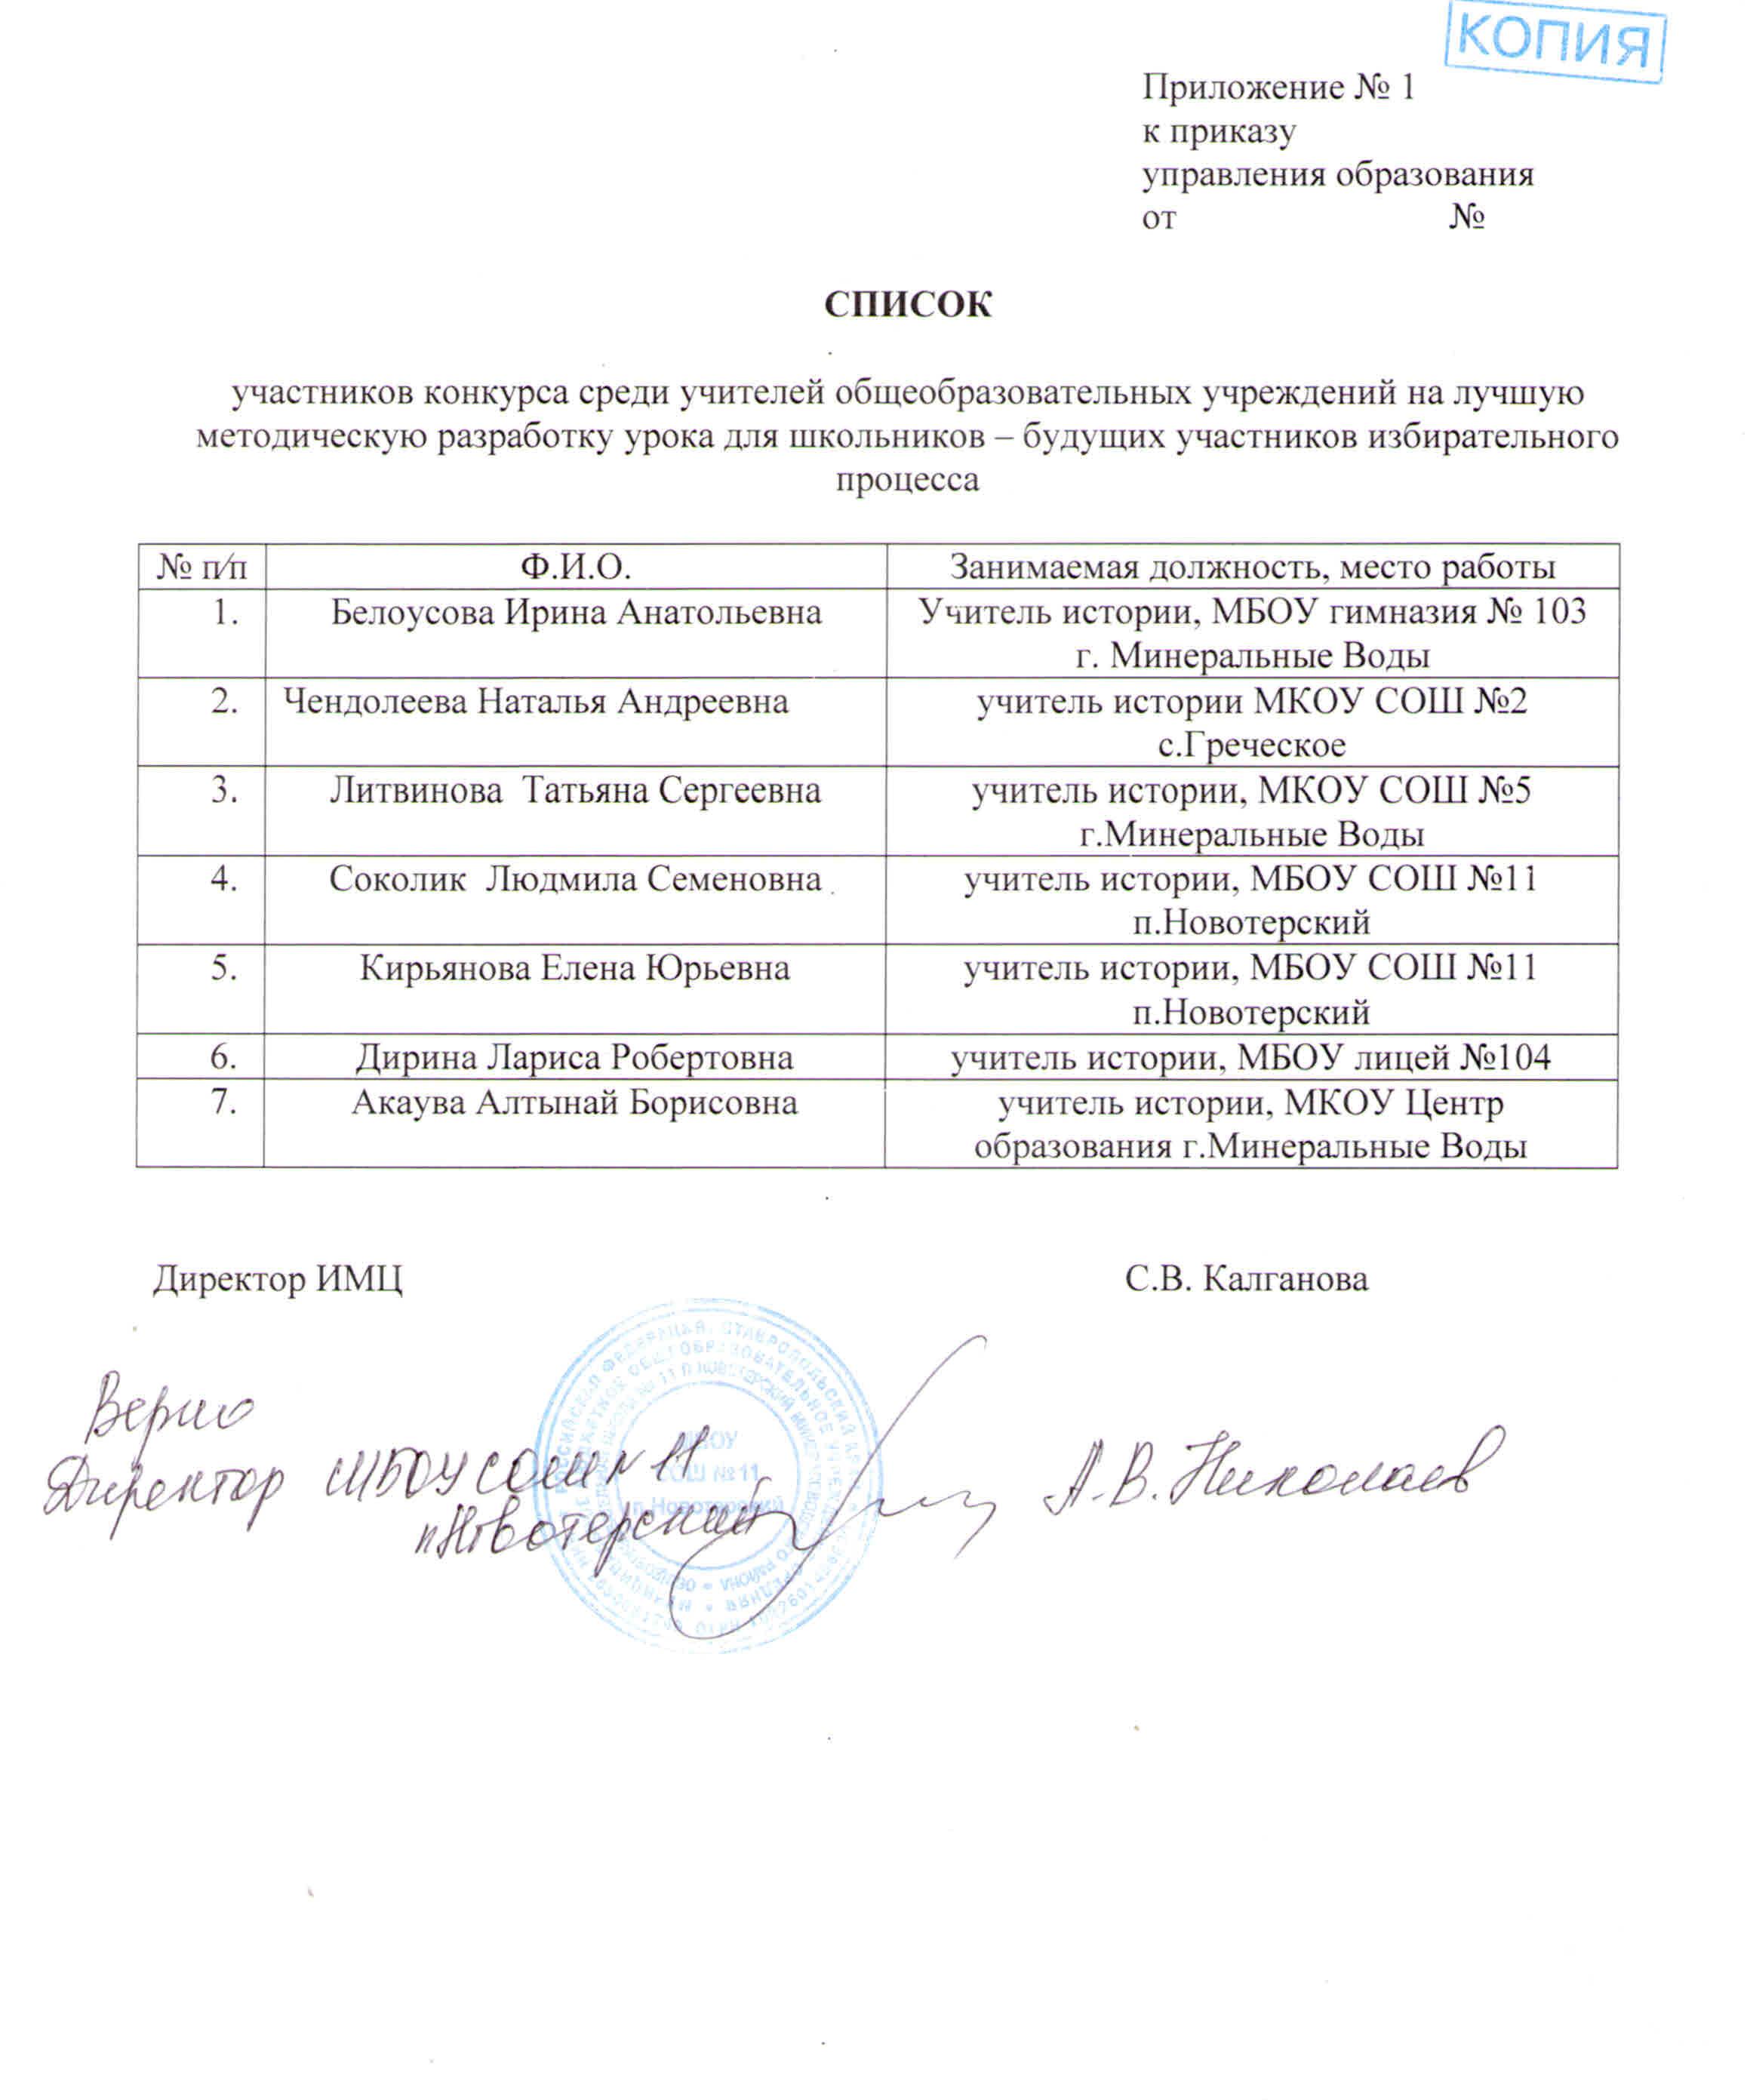 C:\Users\Сергей\Desktop\док-ты\Document_5.jpg